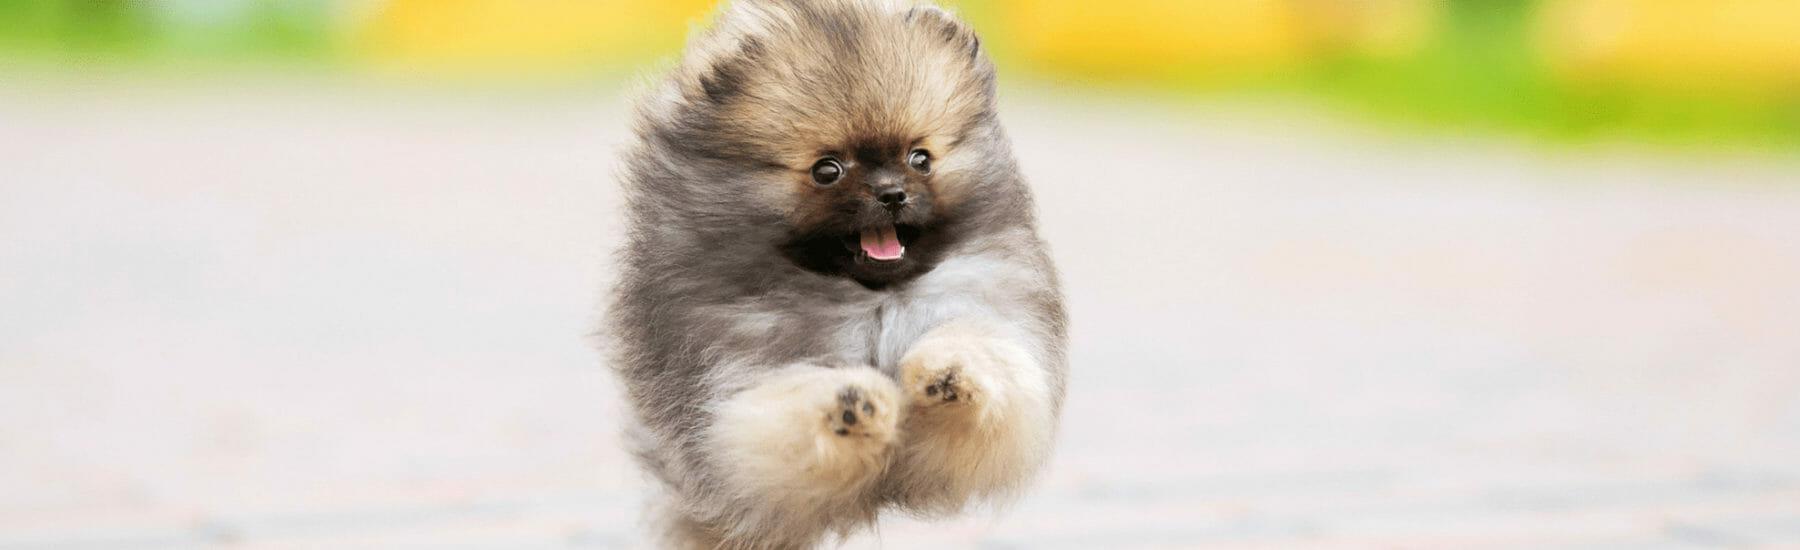 Small fluffy dog jumping